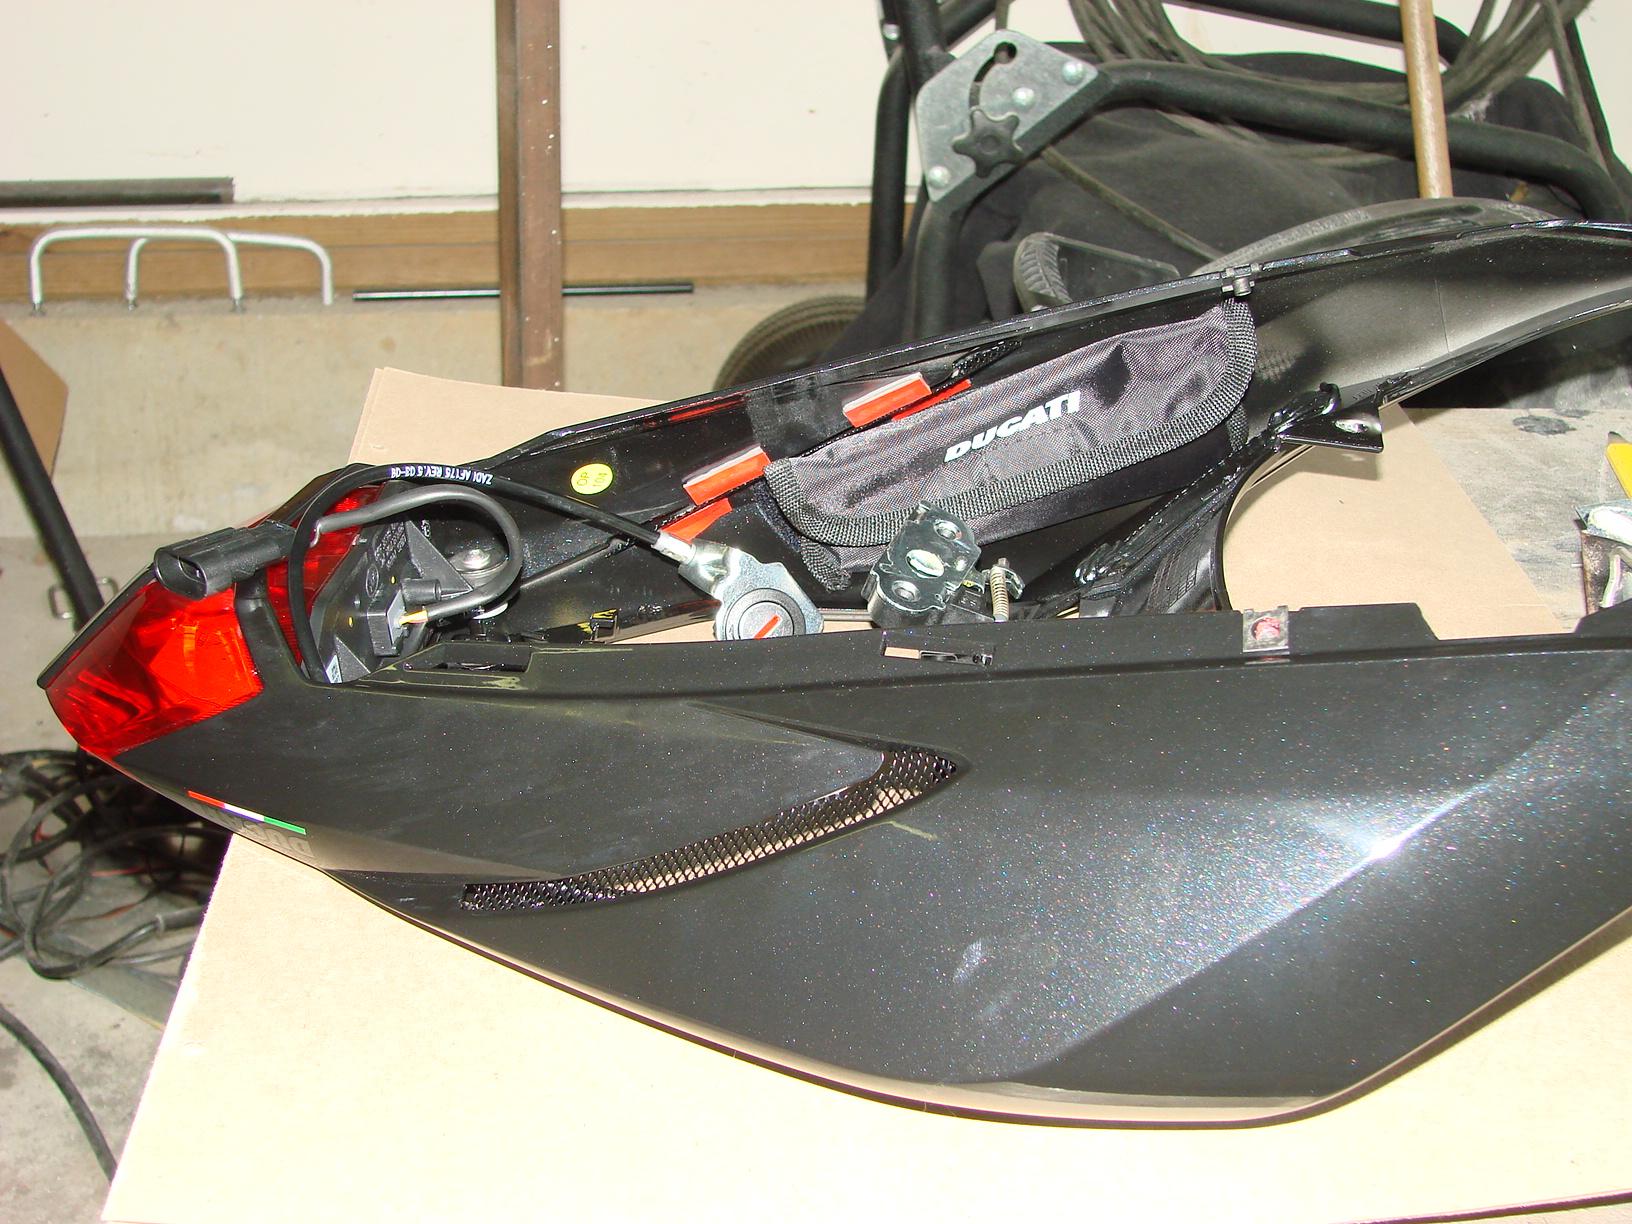 Tool kit? - Ducati ms - The Ultimate Ducati Forum